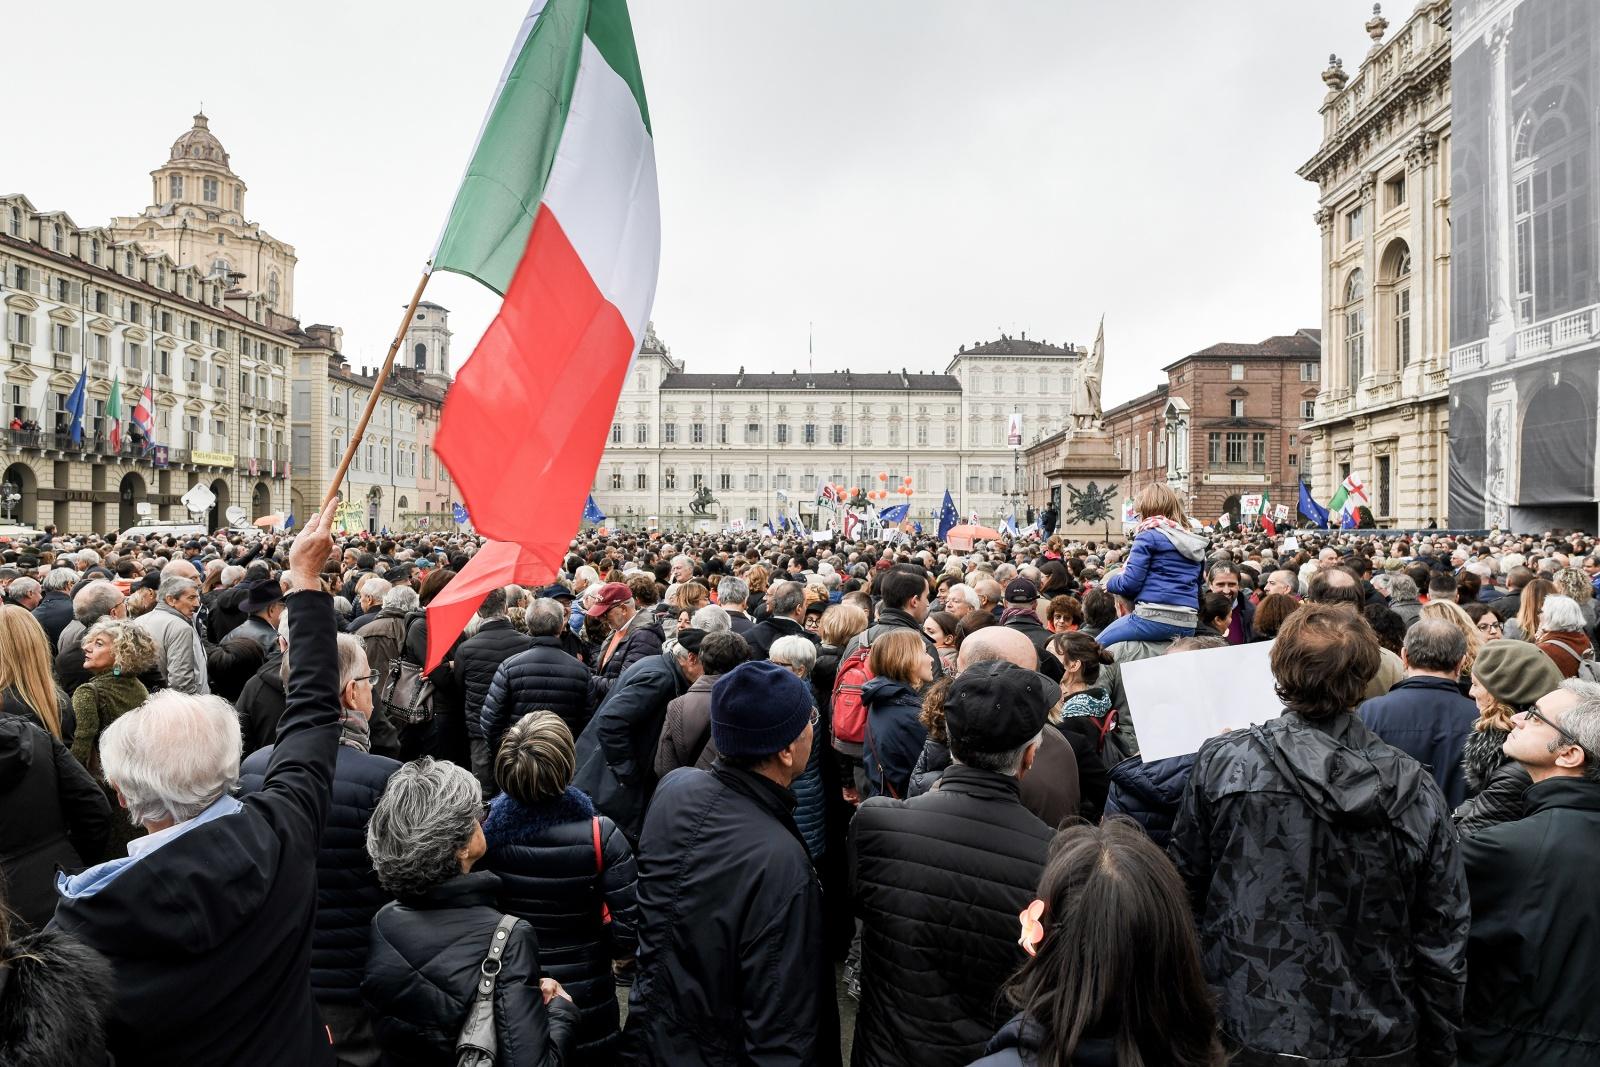 Turin, Italy (2018). Popular event to build Turin-Lyon high-speed railway line